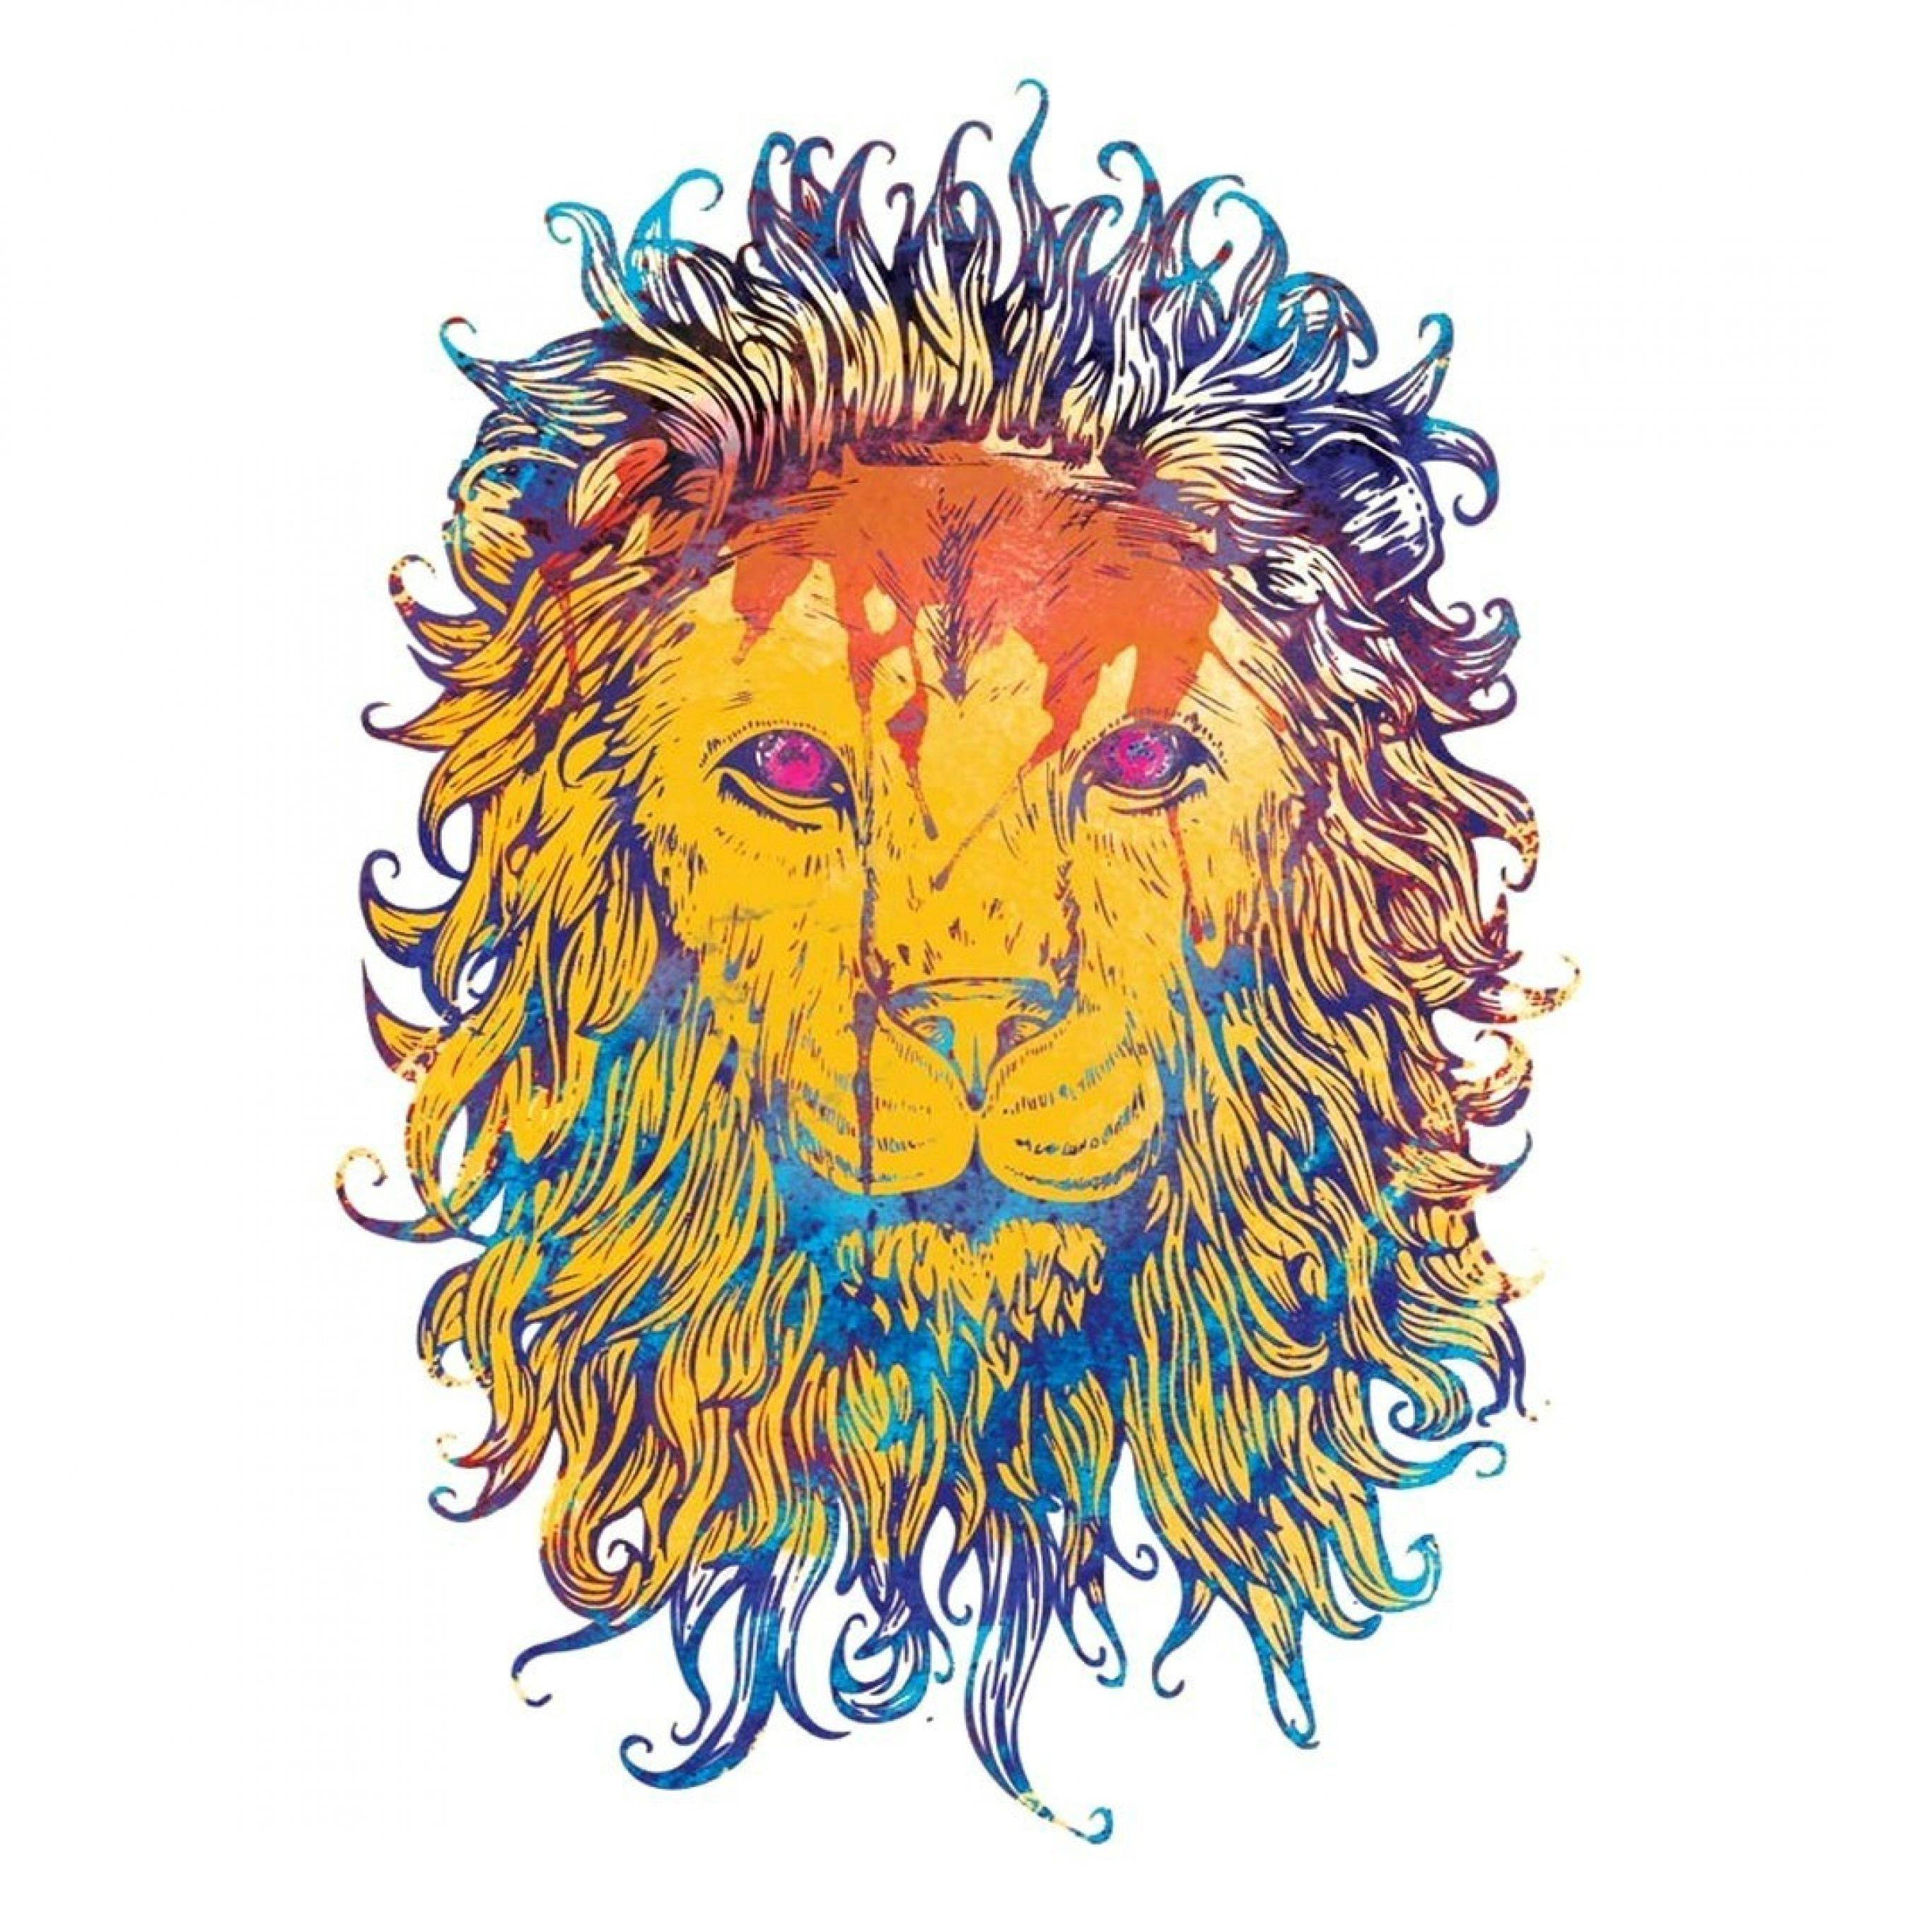 Lion Drawing Wallpaper at GetDrawings